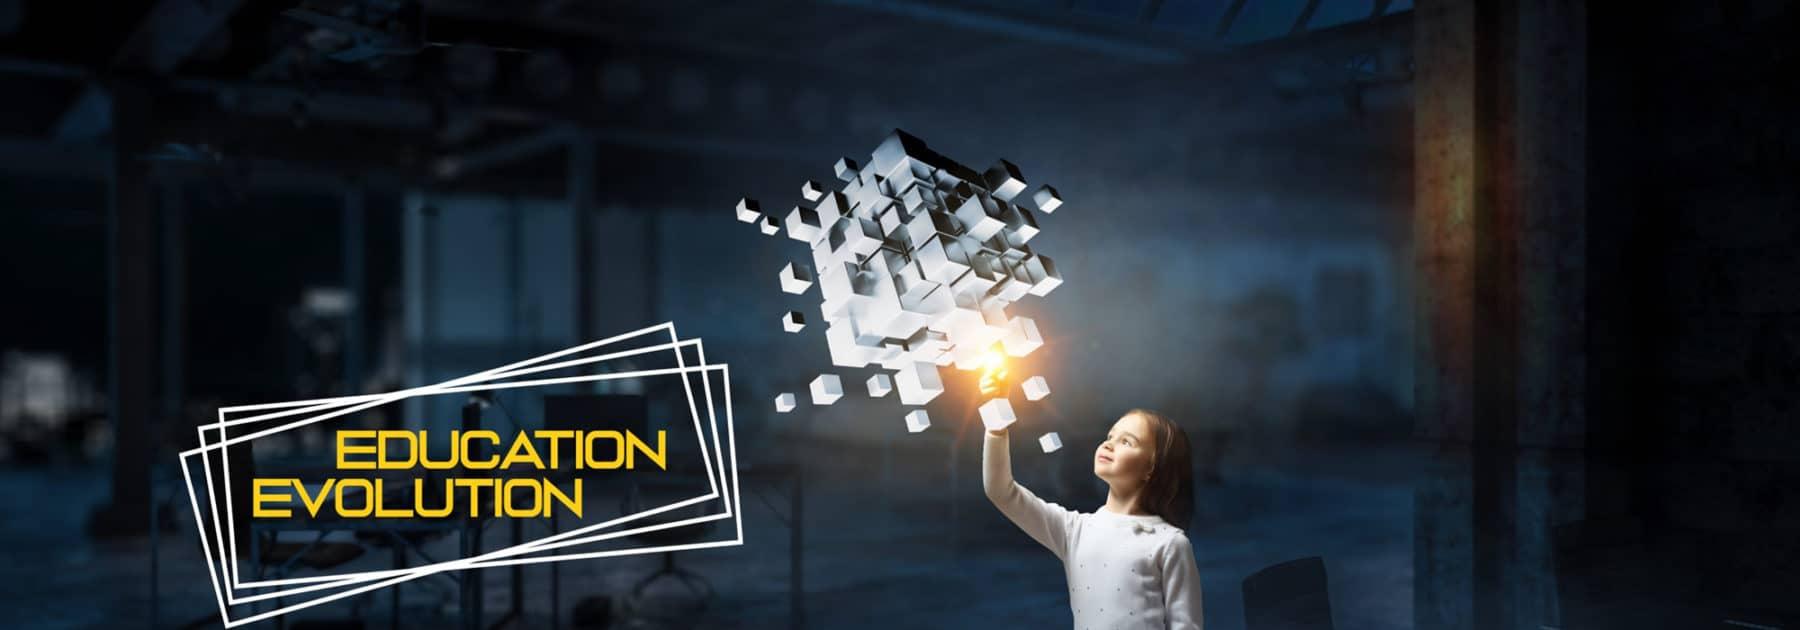 Education Evolution Conference